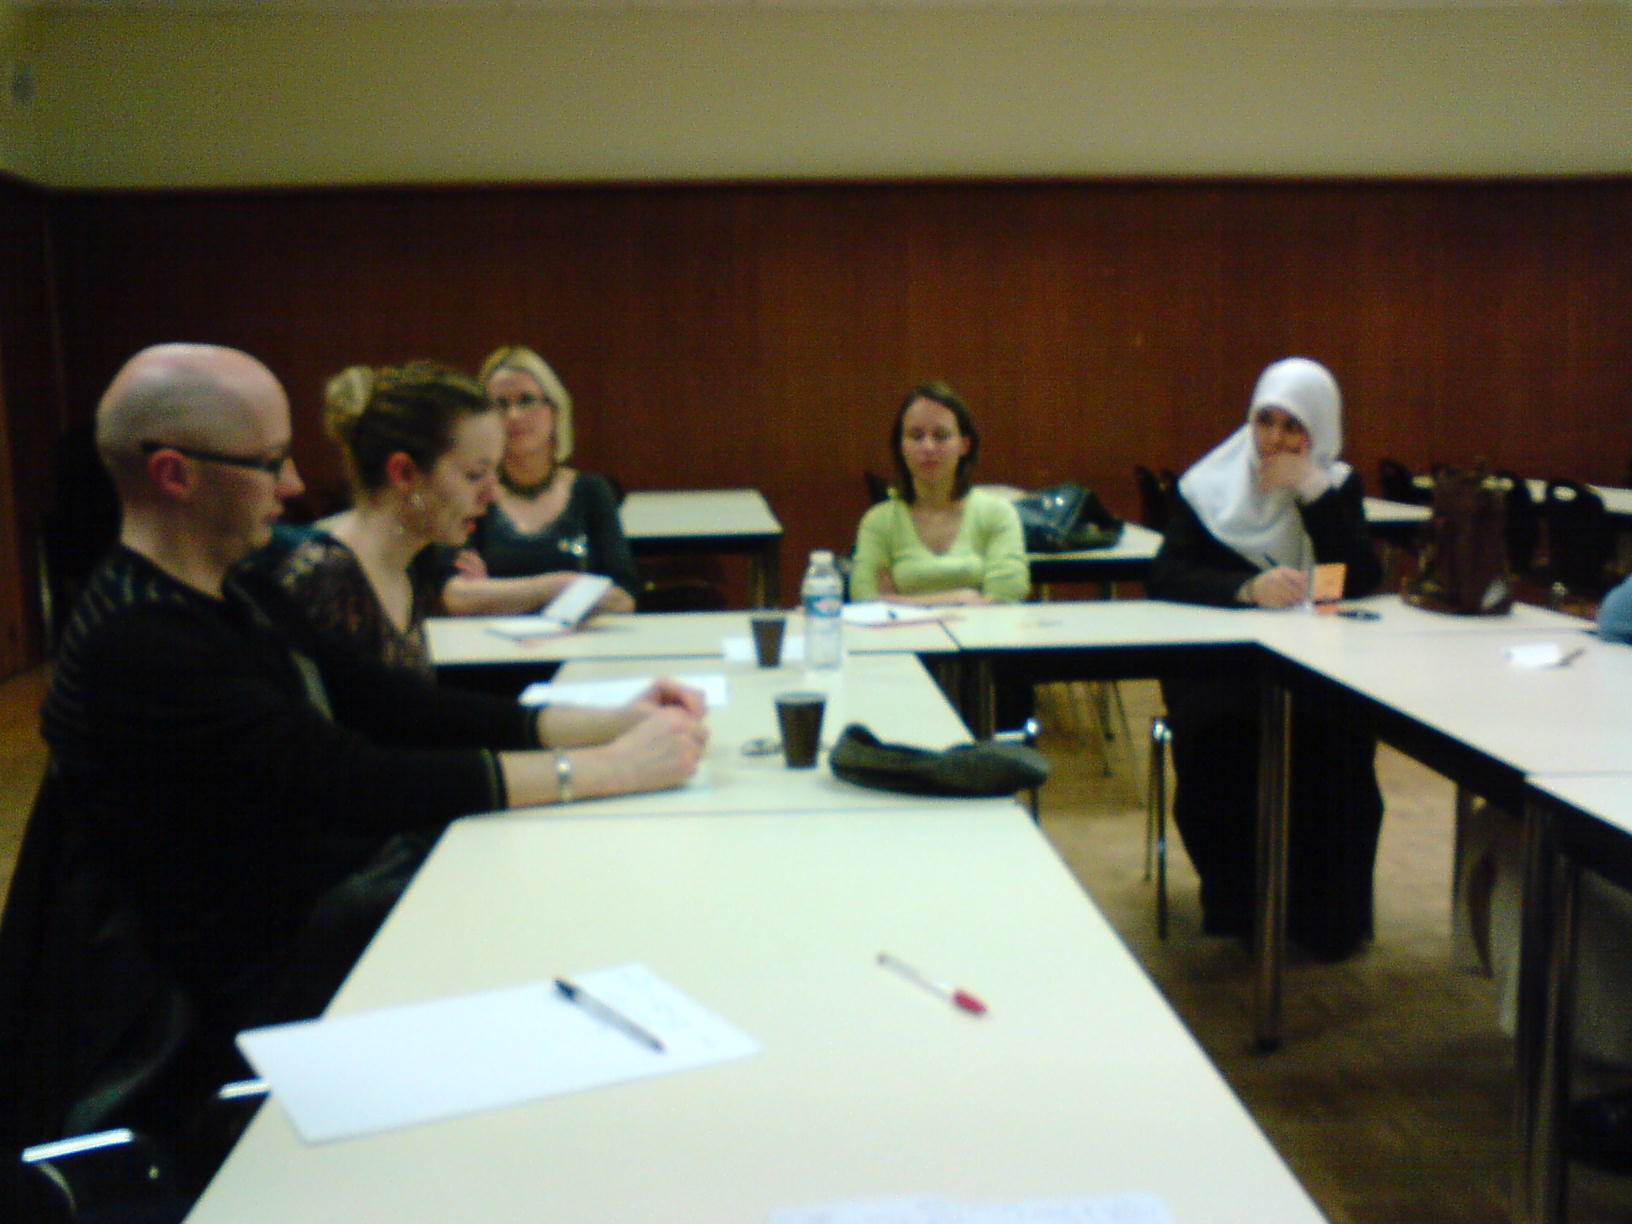 cv analytique maitre de conference word